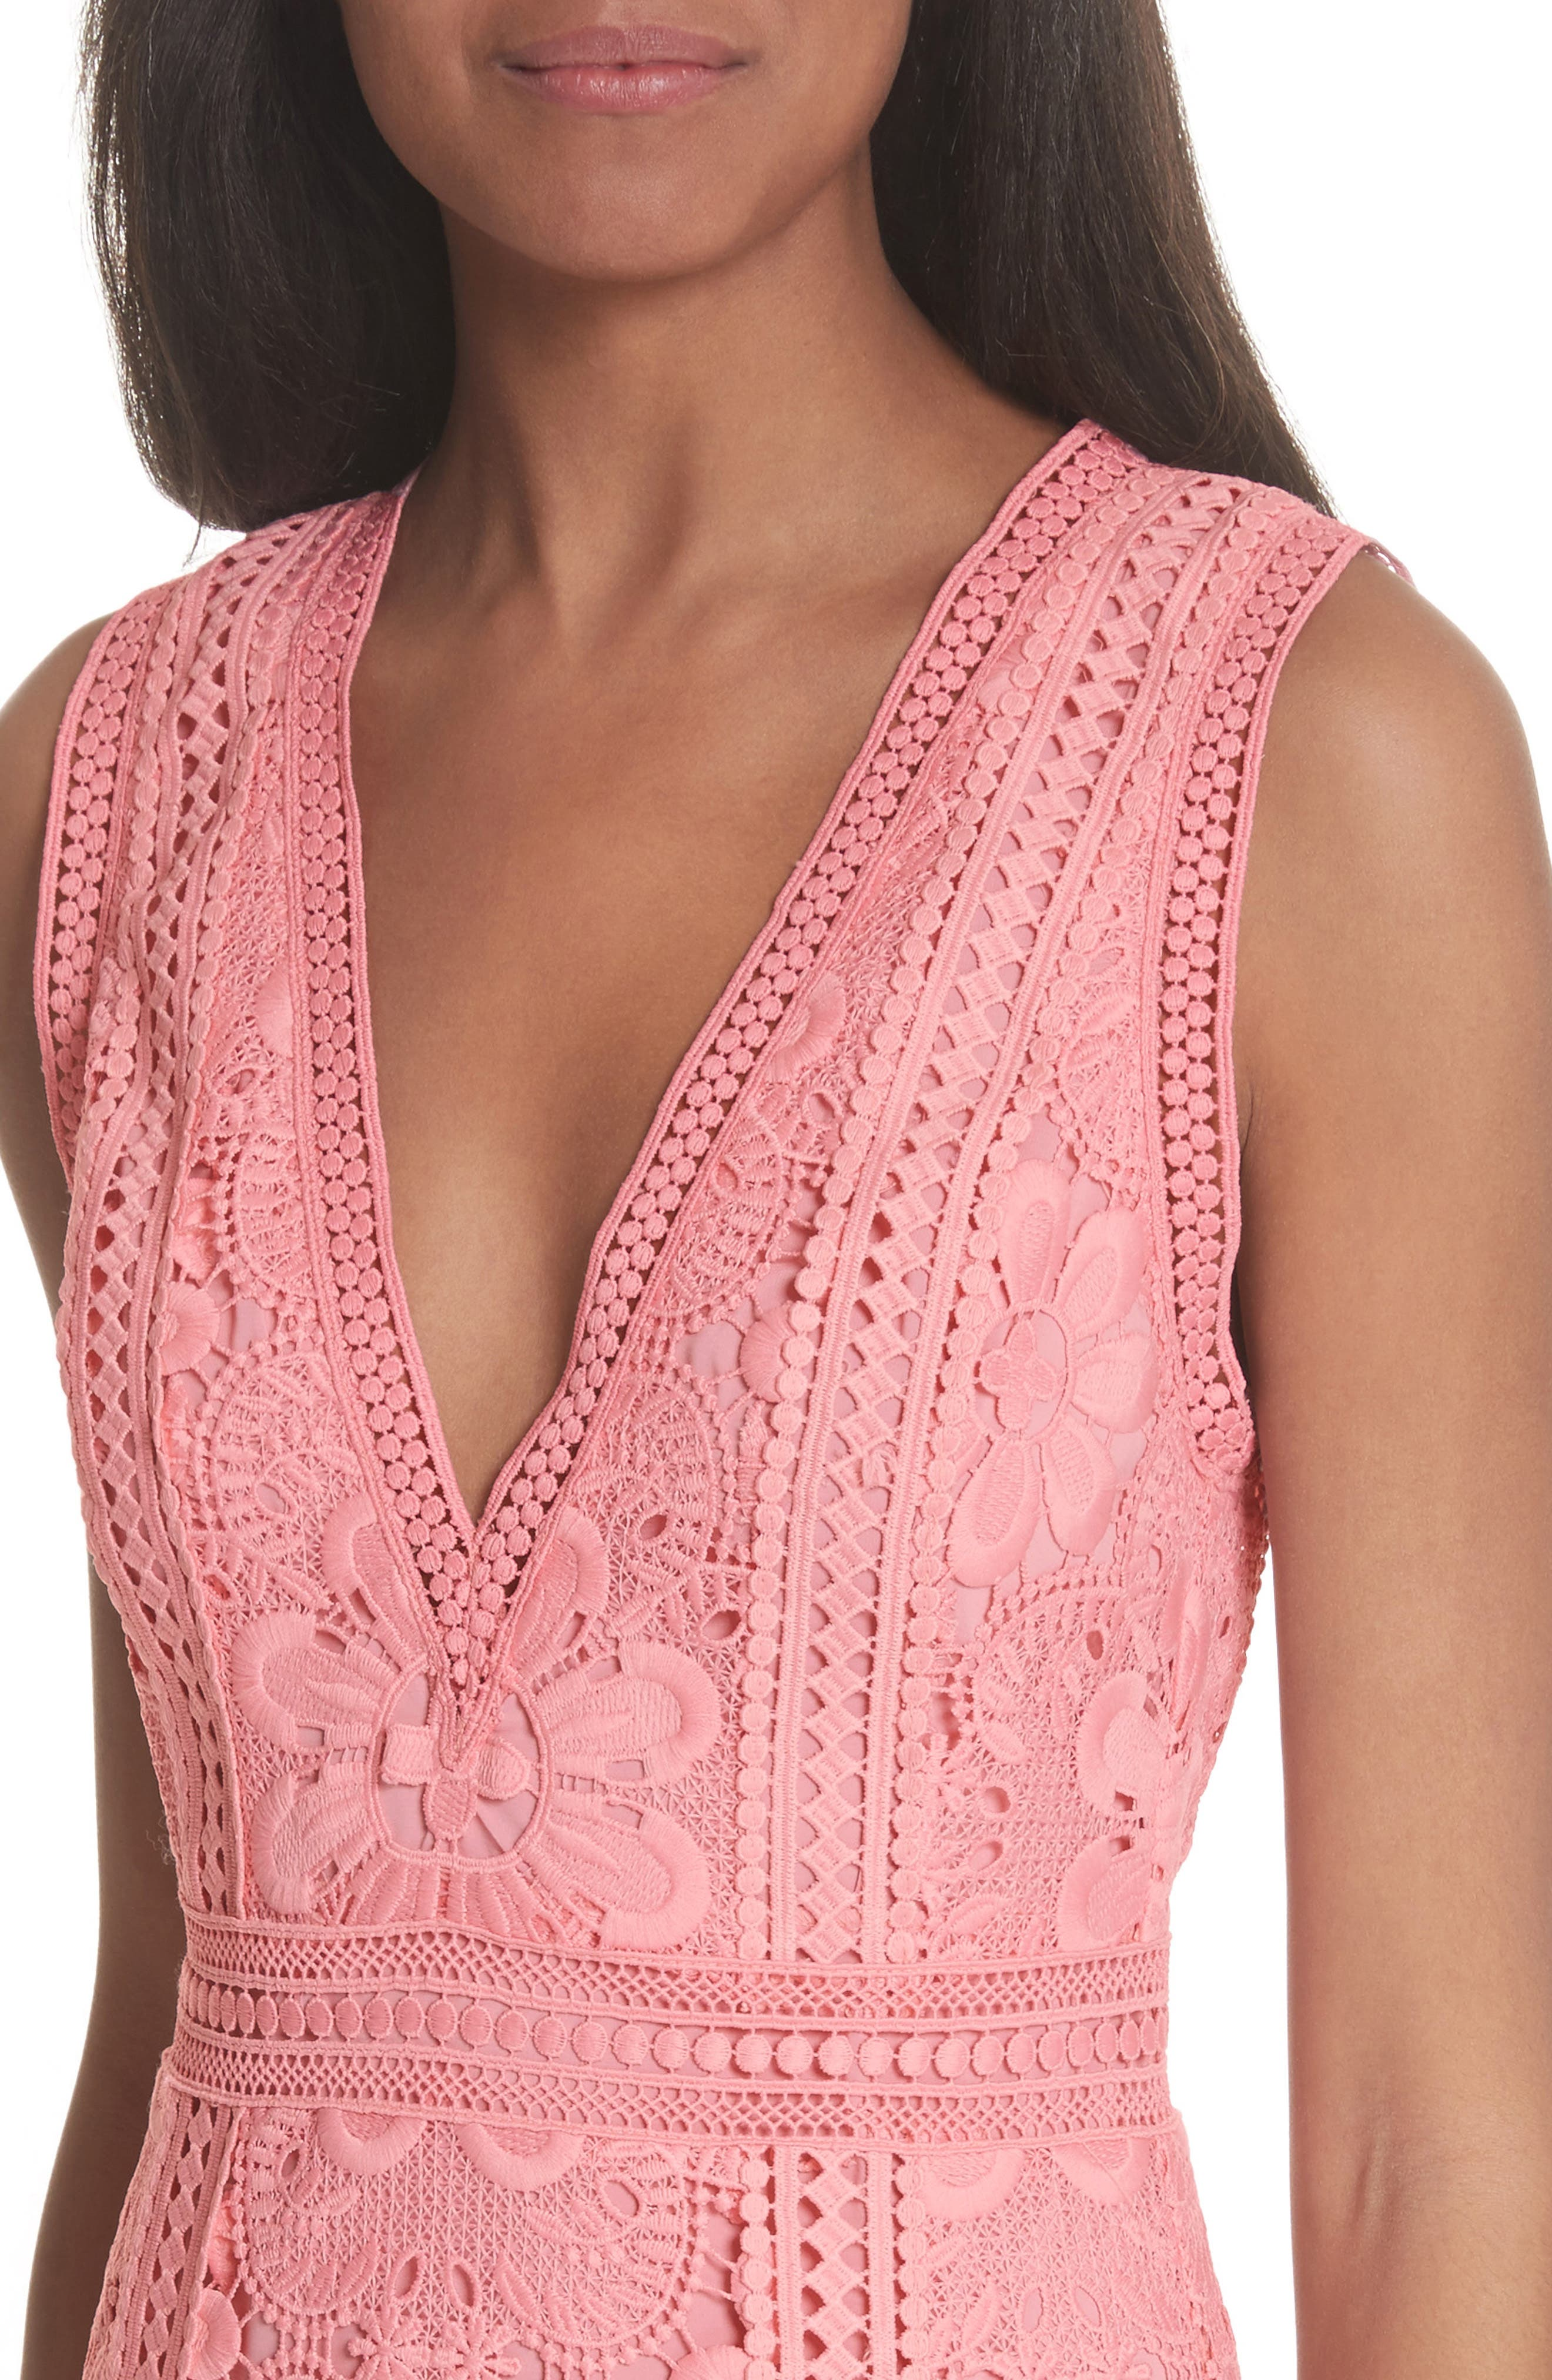 Zula Lace Minidress,                             Alternate thumbnail 4, color,                             Blossom